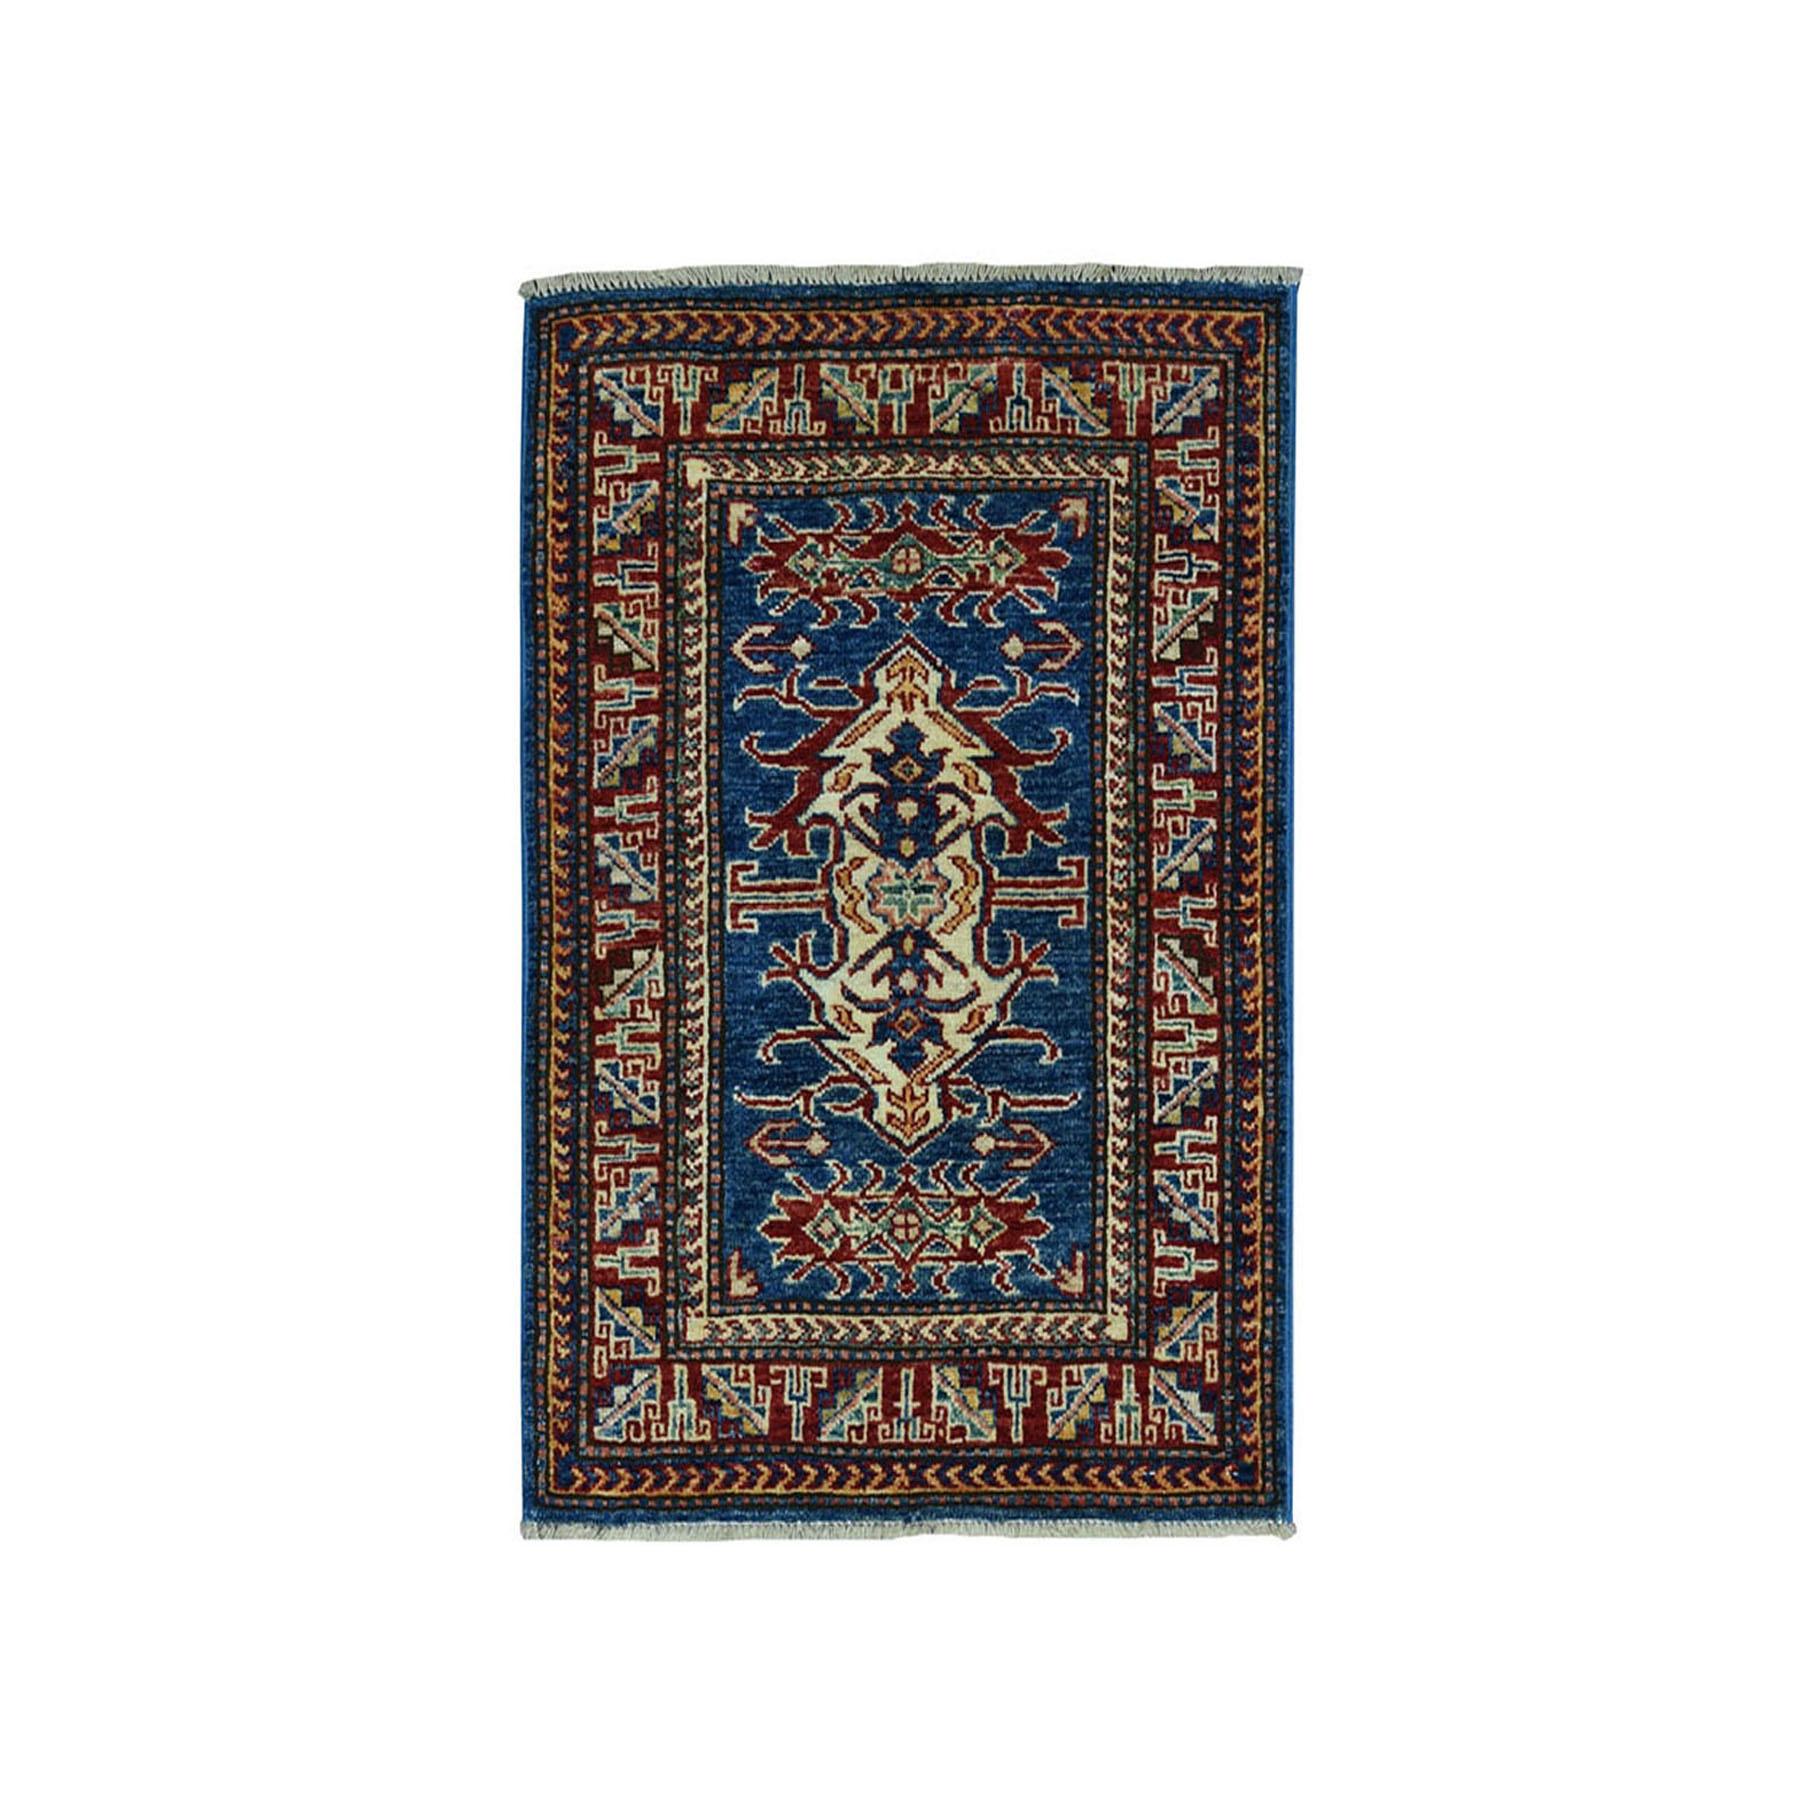 "2'1""x2'9"" Blue Super Kazak Pure Wool Geometric Design Hand-Knotted Oriental Rug 50903"